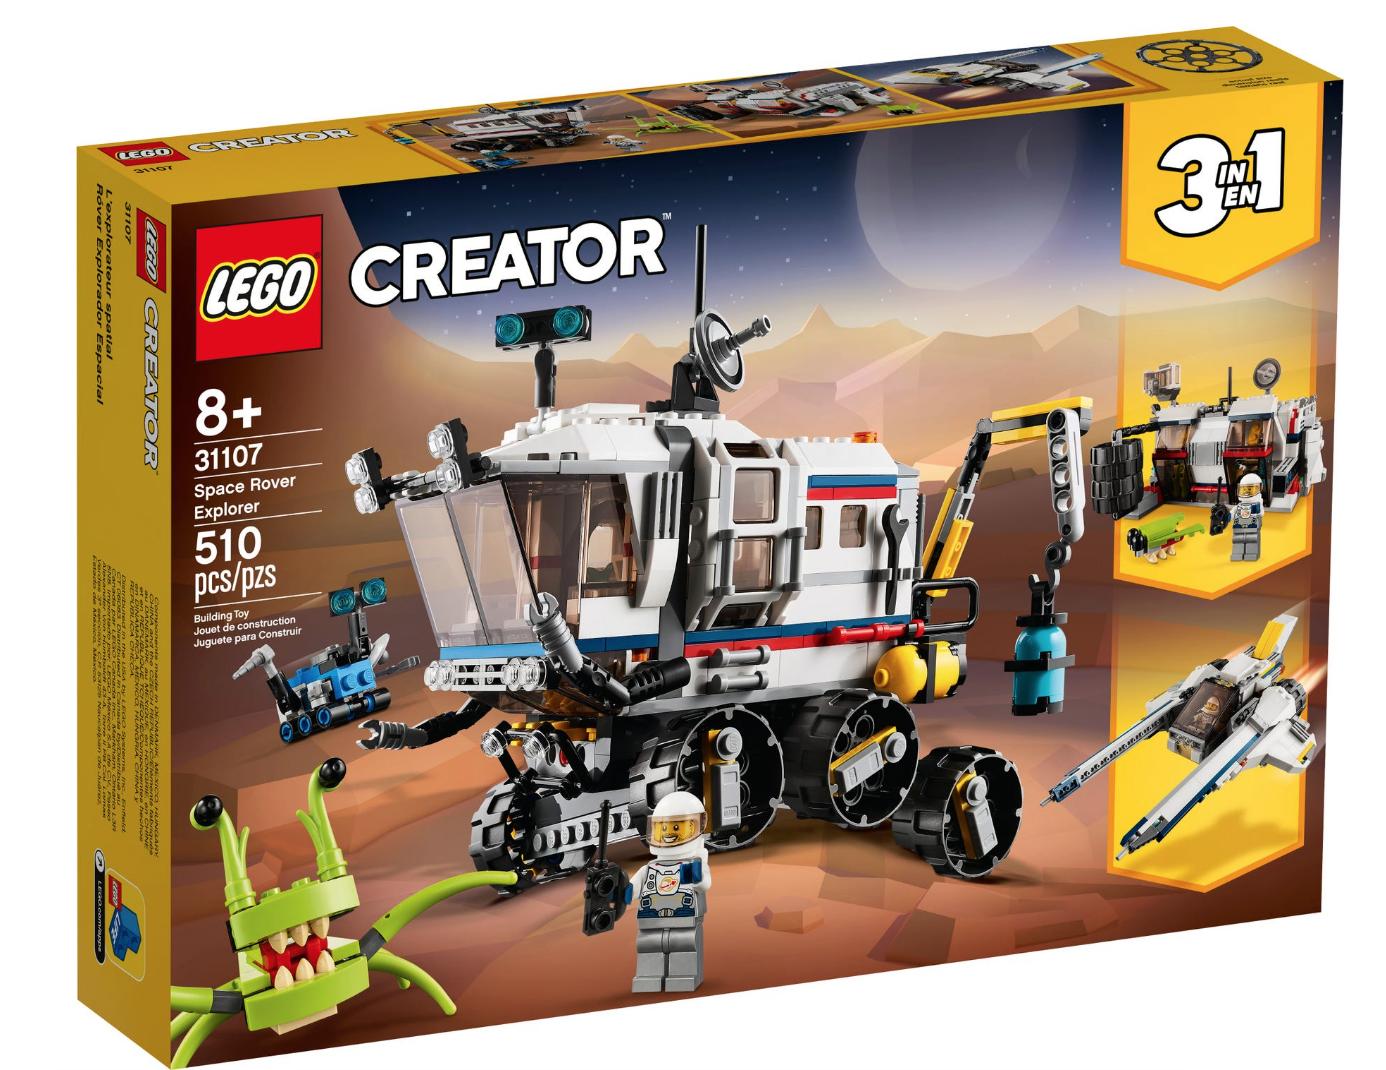 31107 Space Rover Explorer by LEGO Creator